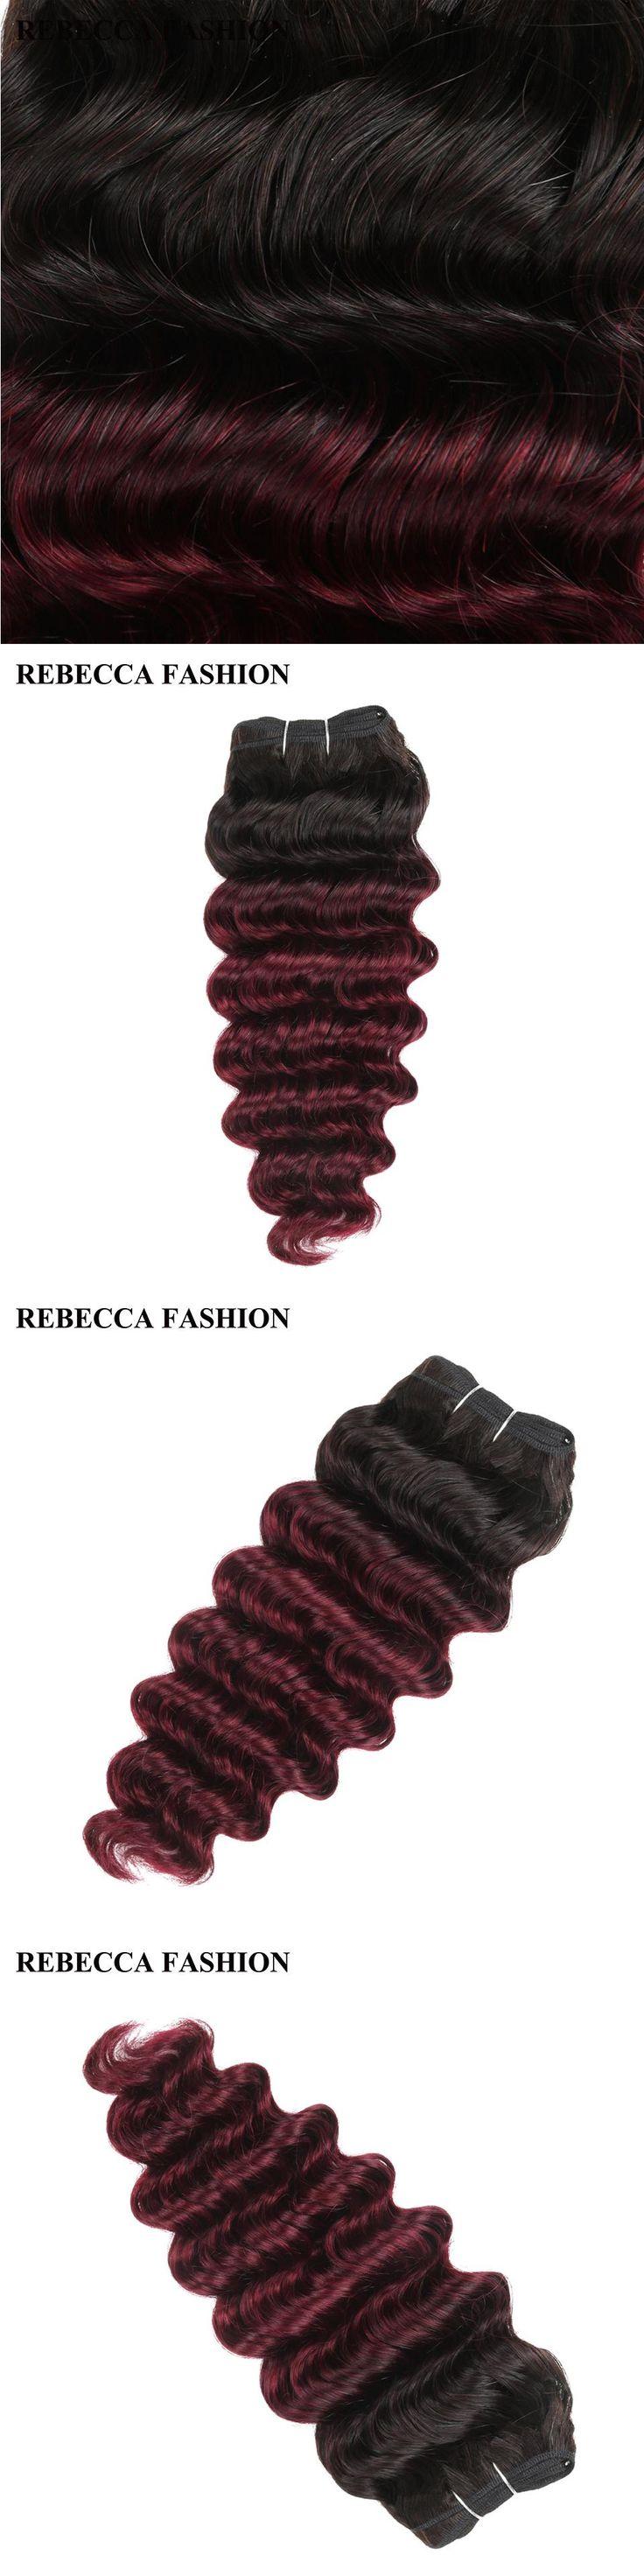 Rebecca remy Human Hair Brazilian Deep Wave Hair Weave 1 Bundle  Ombre wine red Salon Hair T1b99j High Ratio longest Hair PP 40%